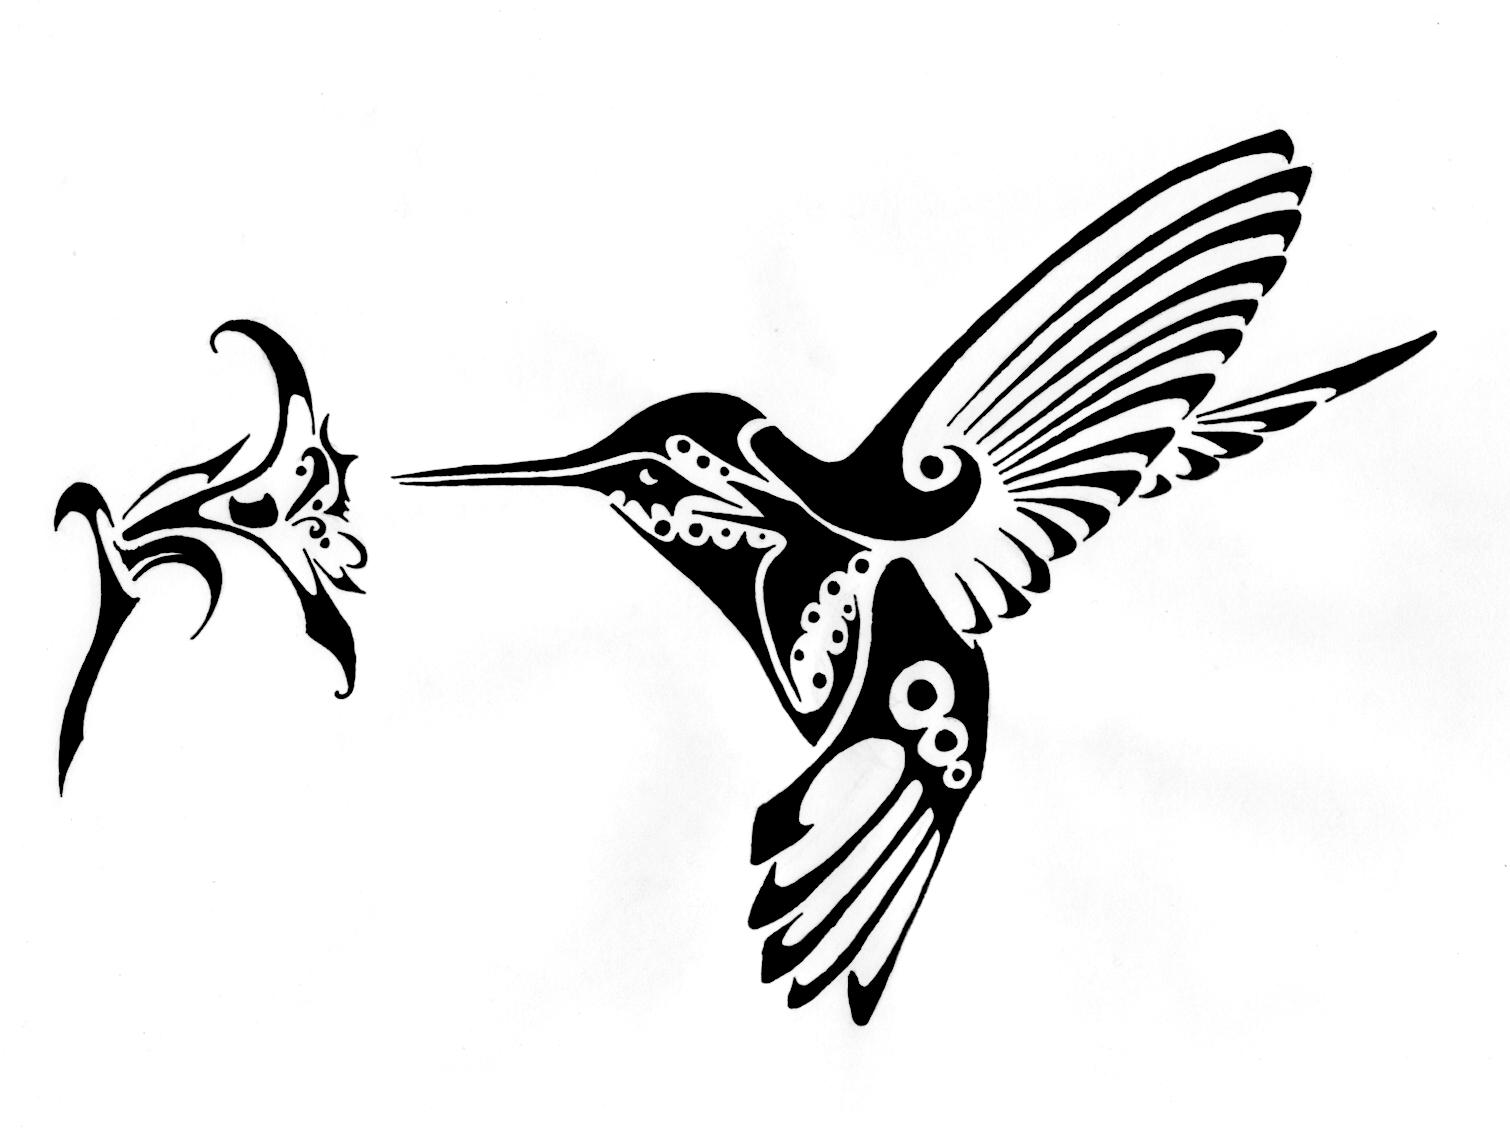 kathy 39 s catworld oh my life hummingbirds. Black Bedroom Furniture Sets. Home Design Ideas